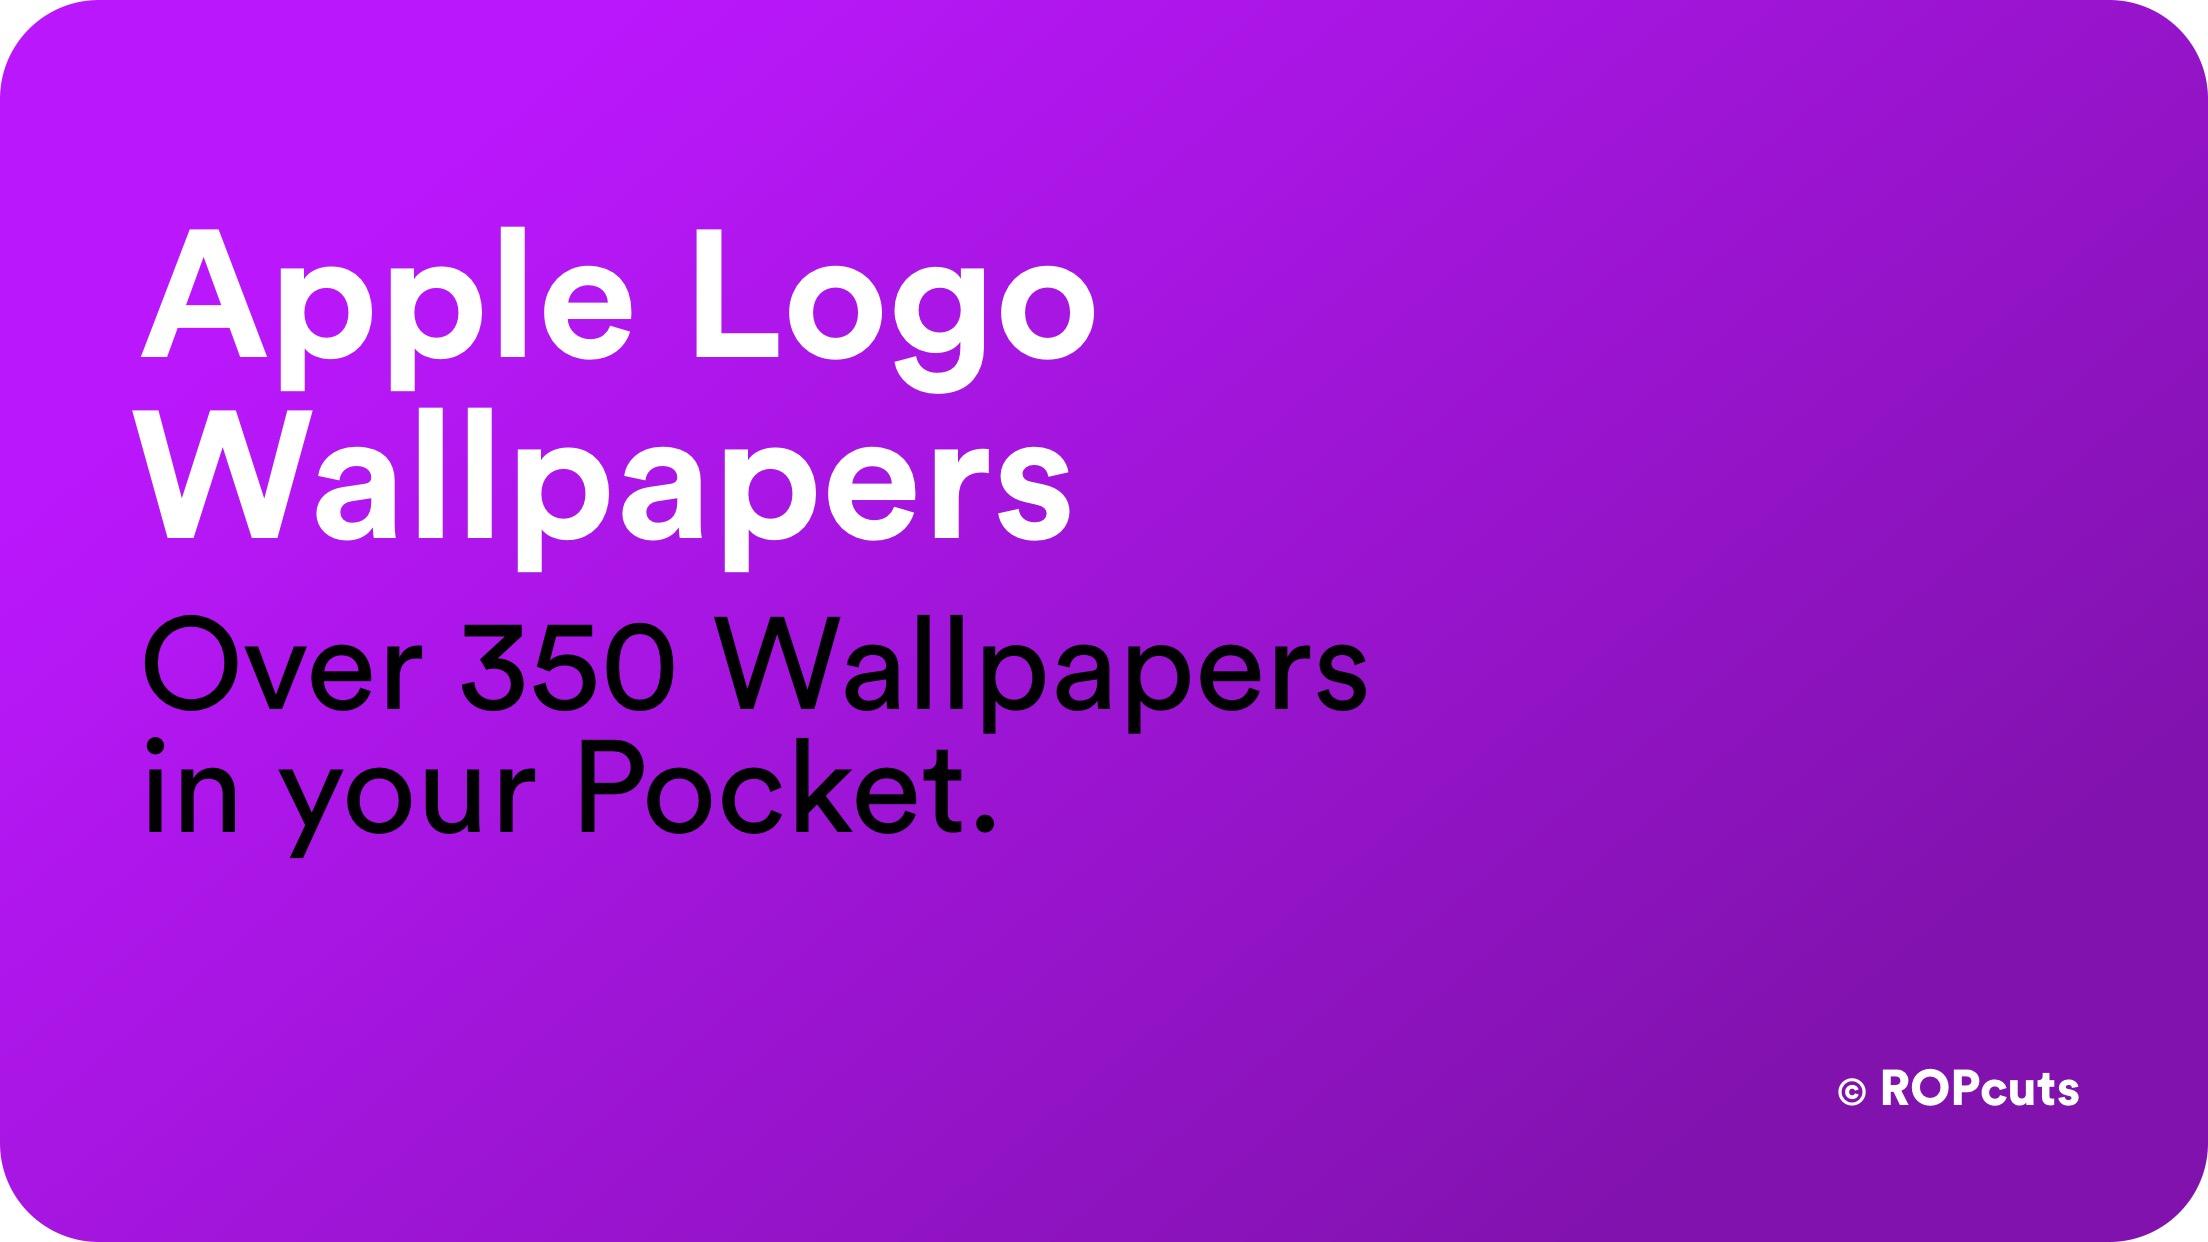 Apple Logo Wallpapers